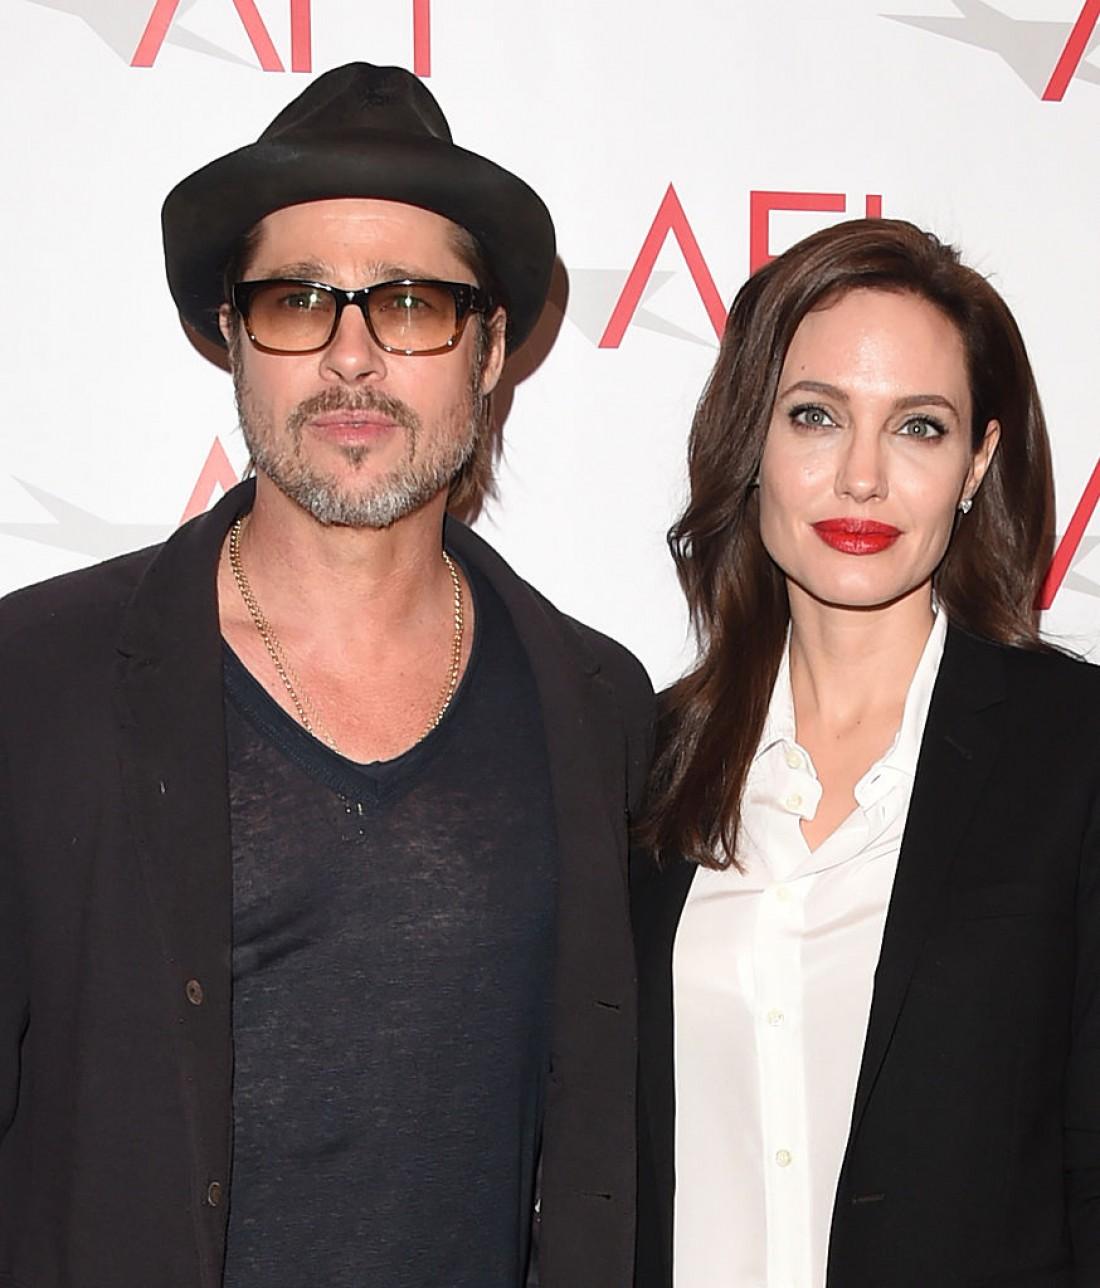 Анджелина Джоли и Брэд Питт проведут Хэллоуин вместе ... анджелина джоли и брэд питт